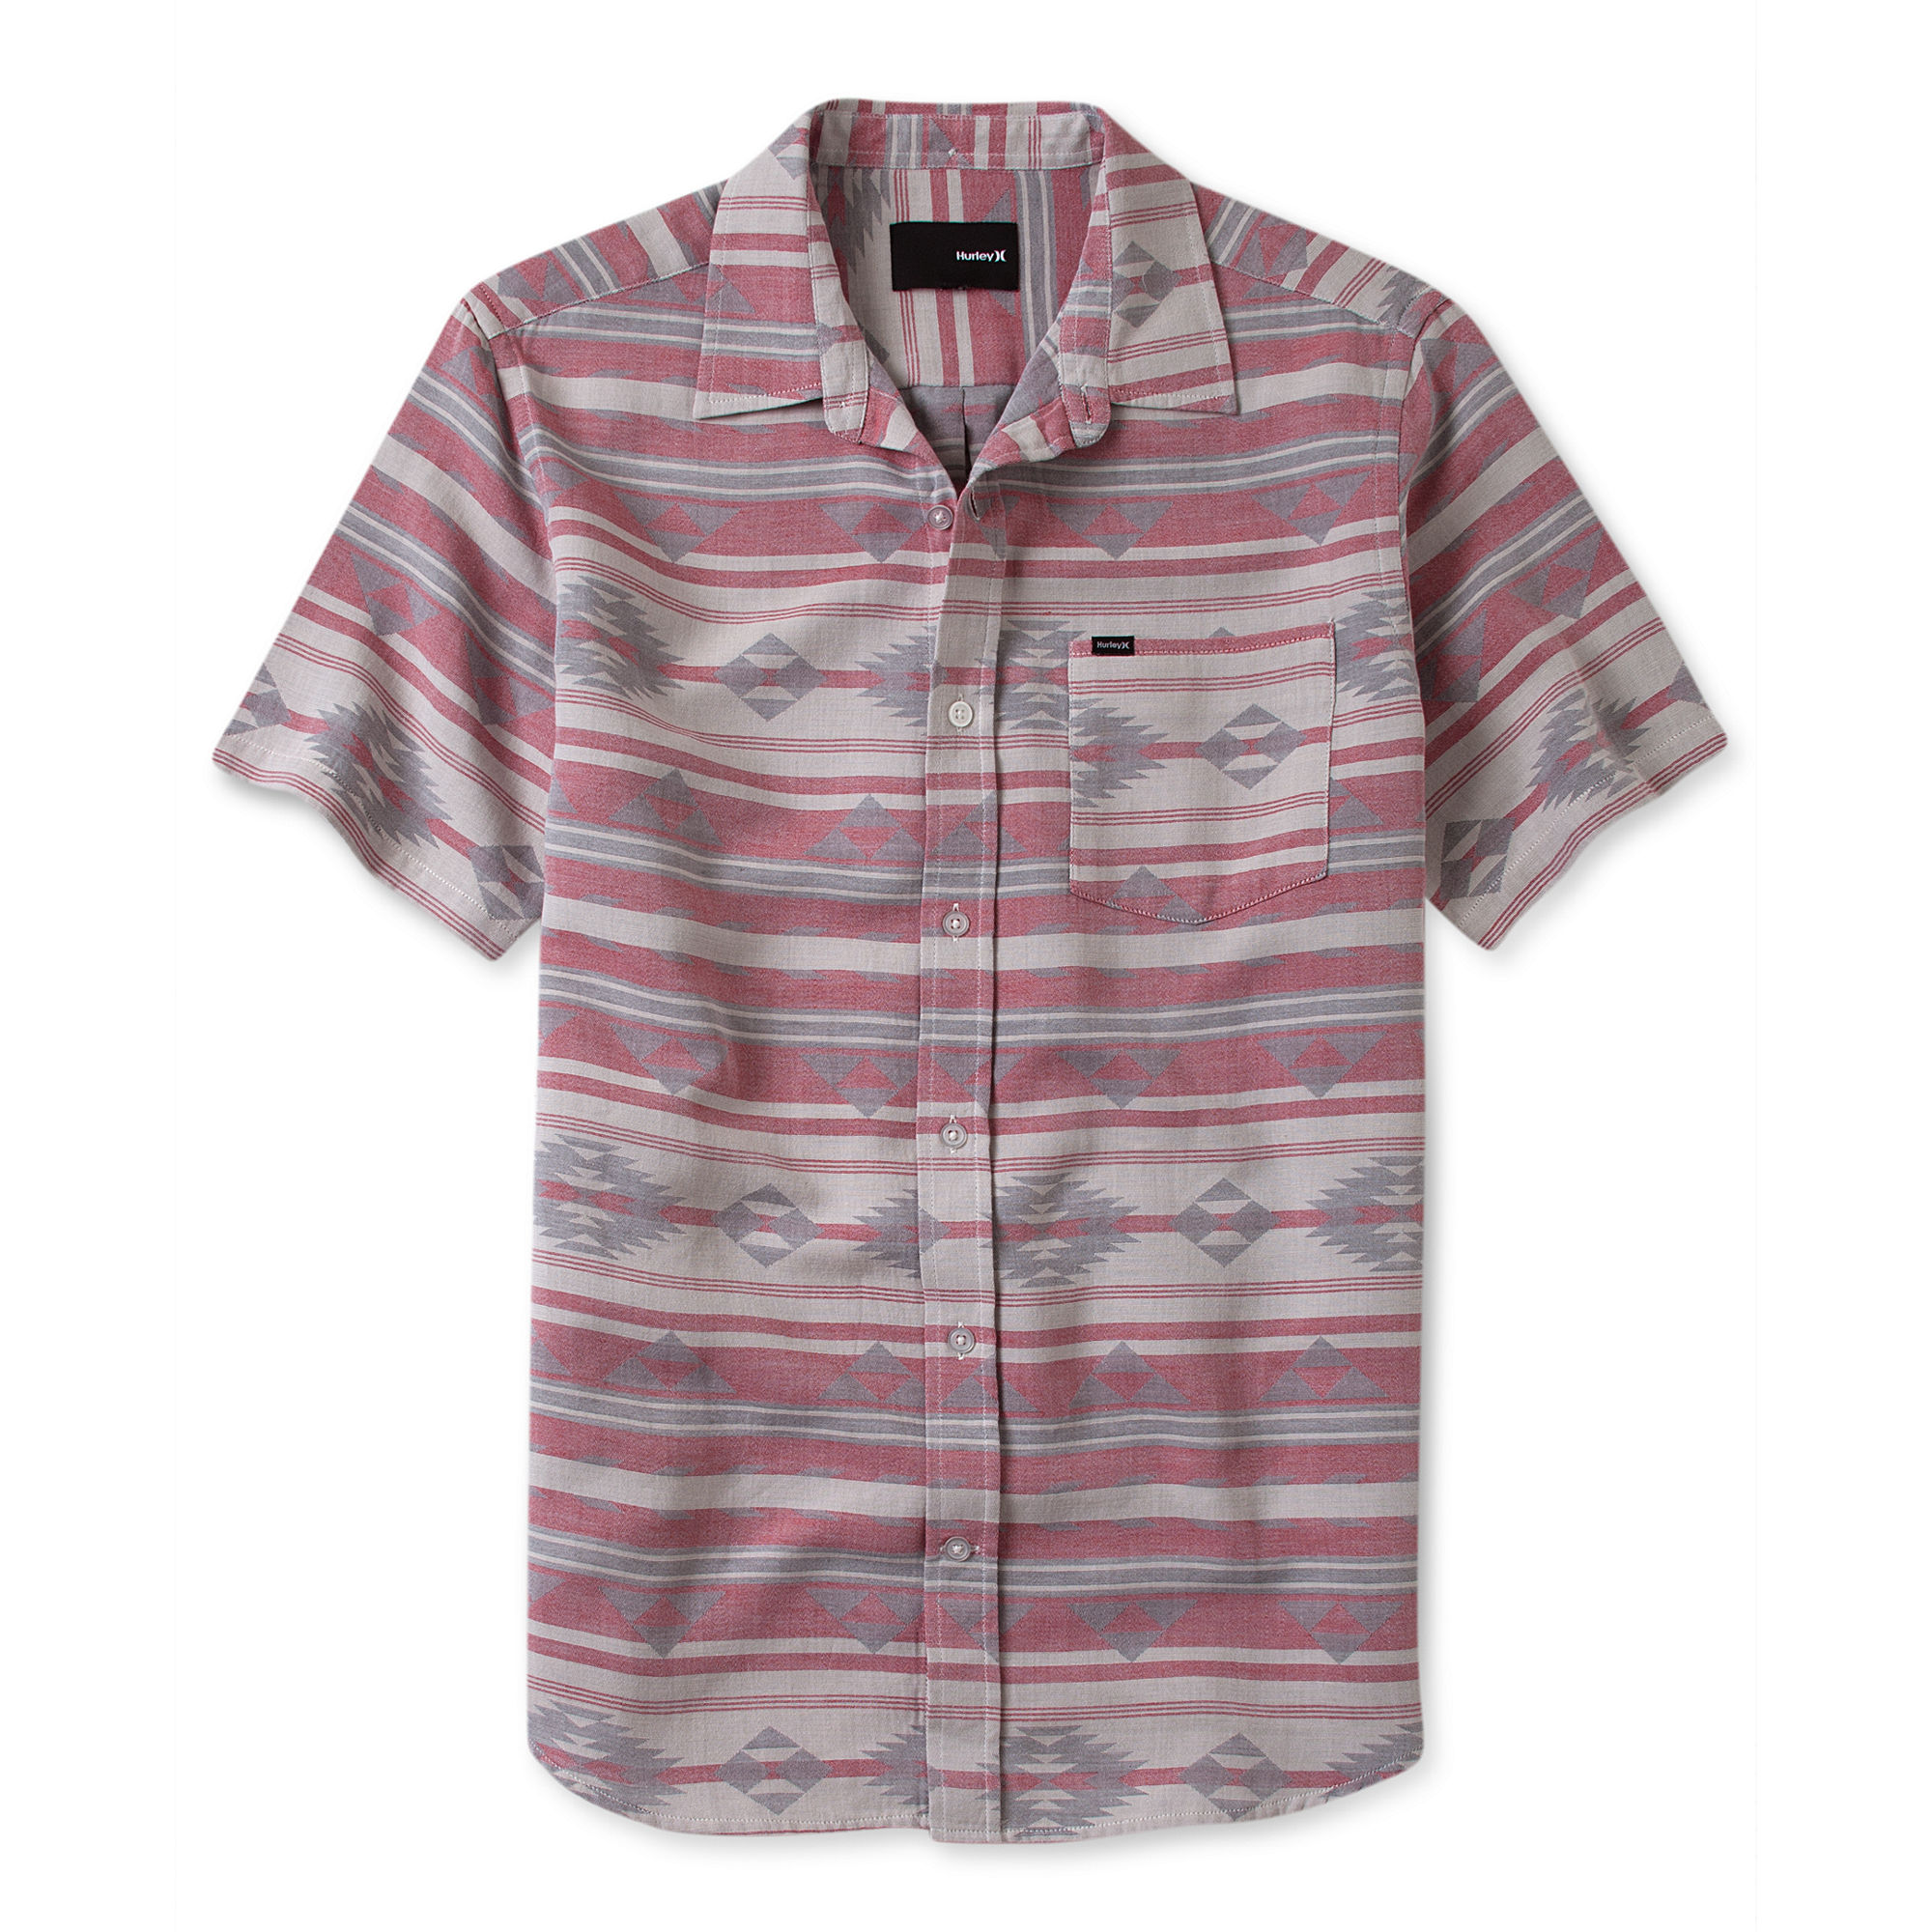 Lyst Hurley Bismark Short Sleeve Southwest Print Shirt in Brown